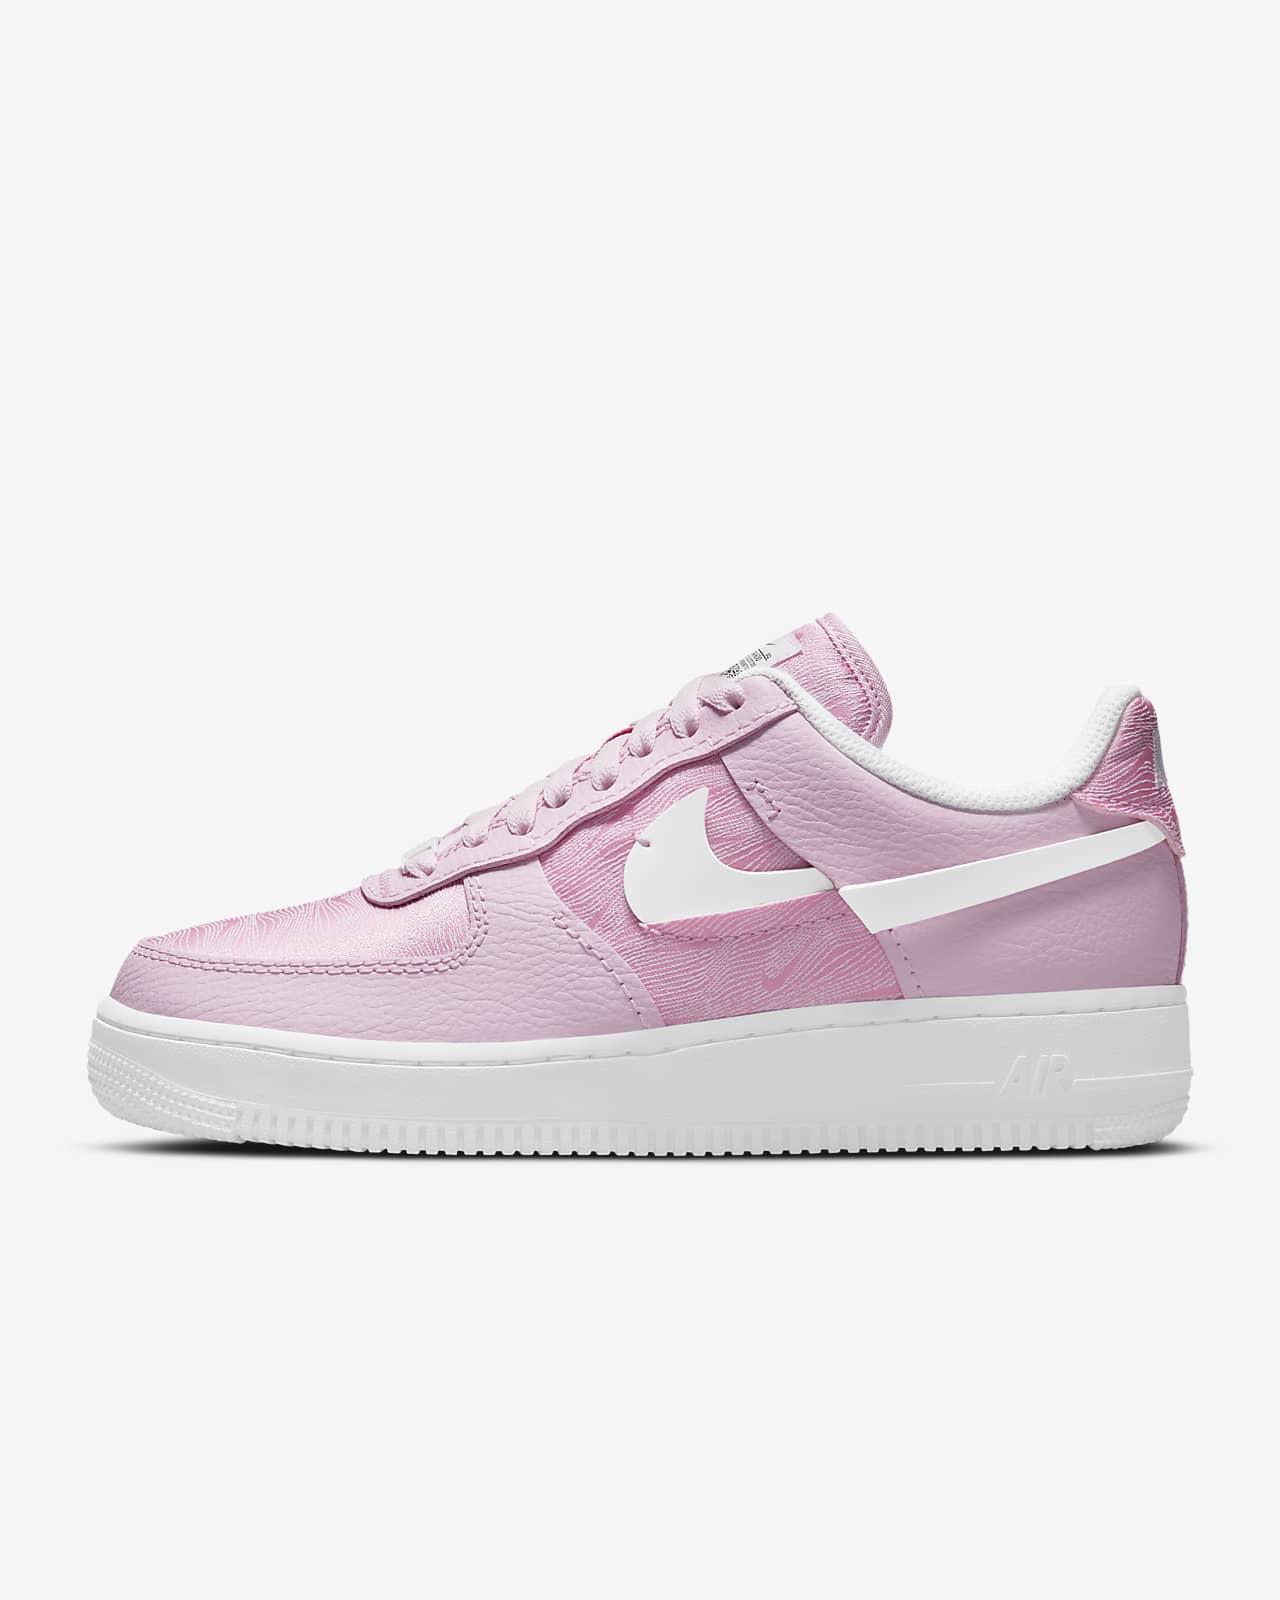 Calzado para mujer Nike Air Force 1 LXX